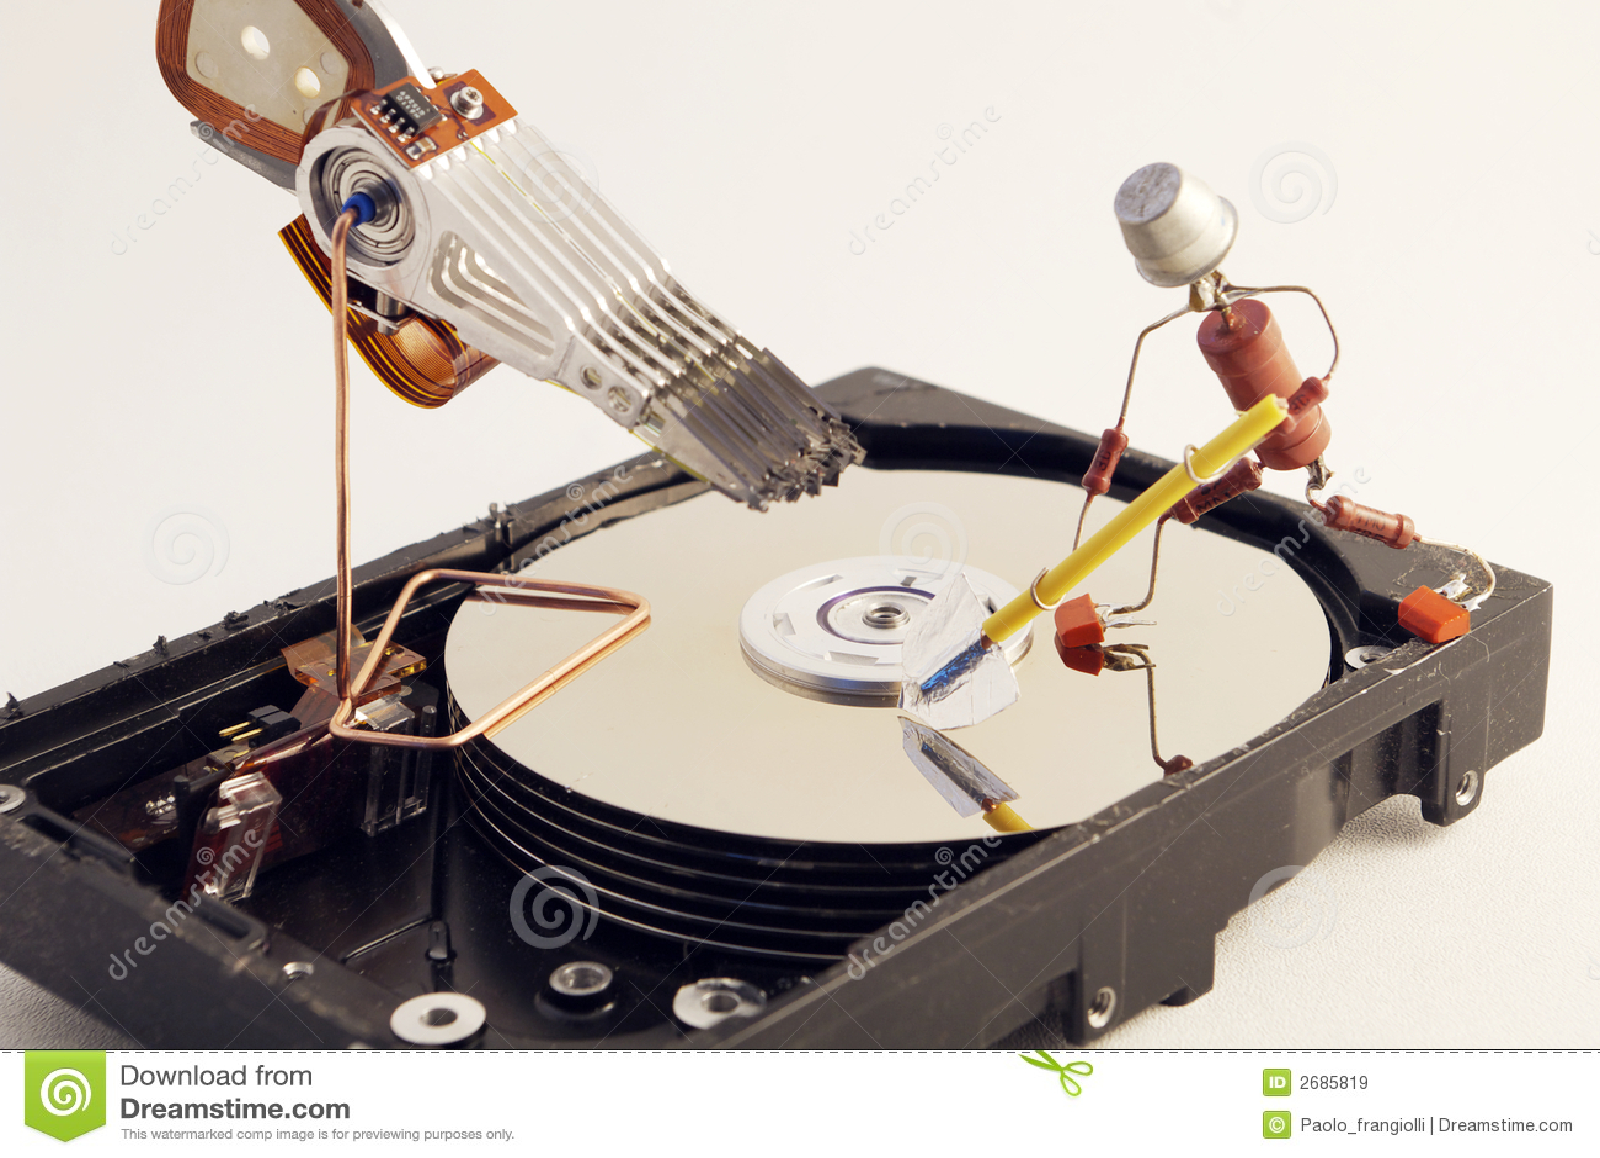 HDD Repair Royalty Free Stock Images - Image: 2685819